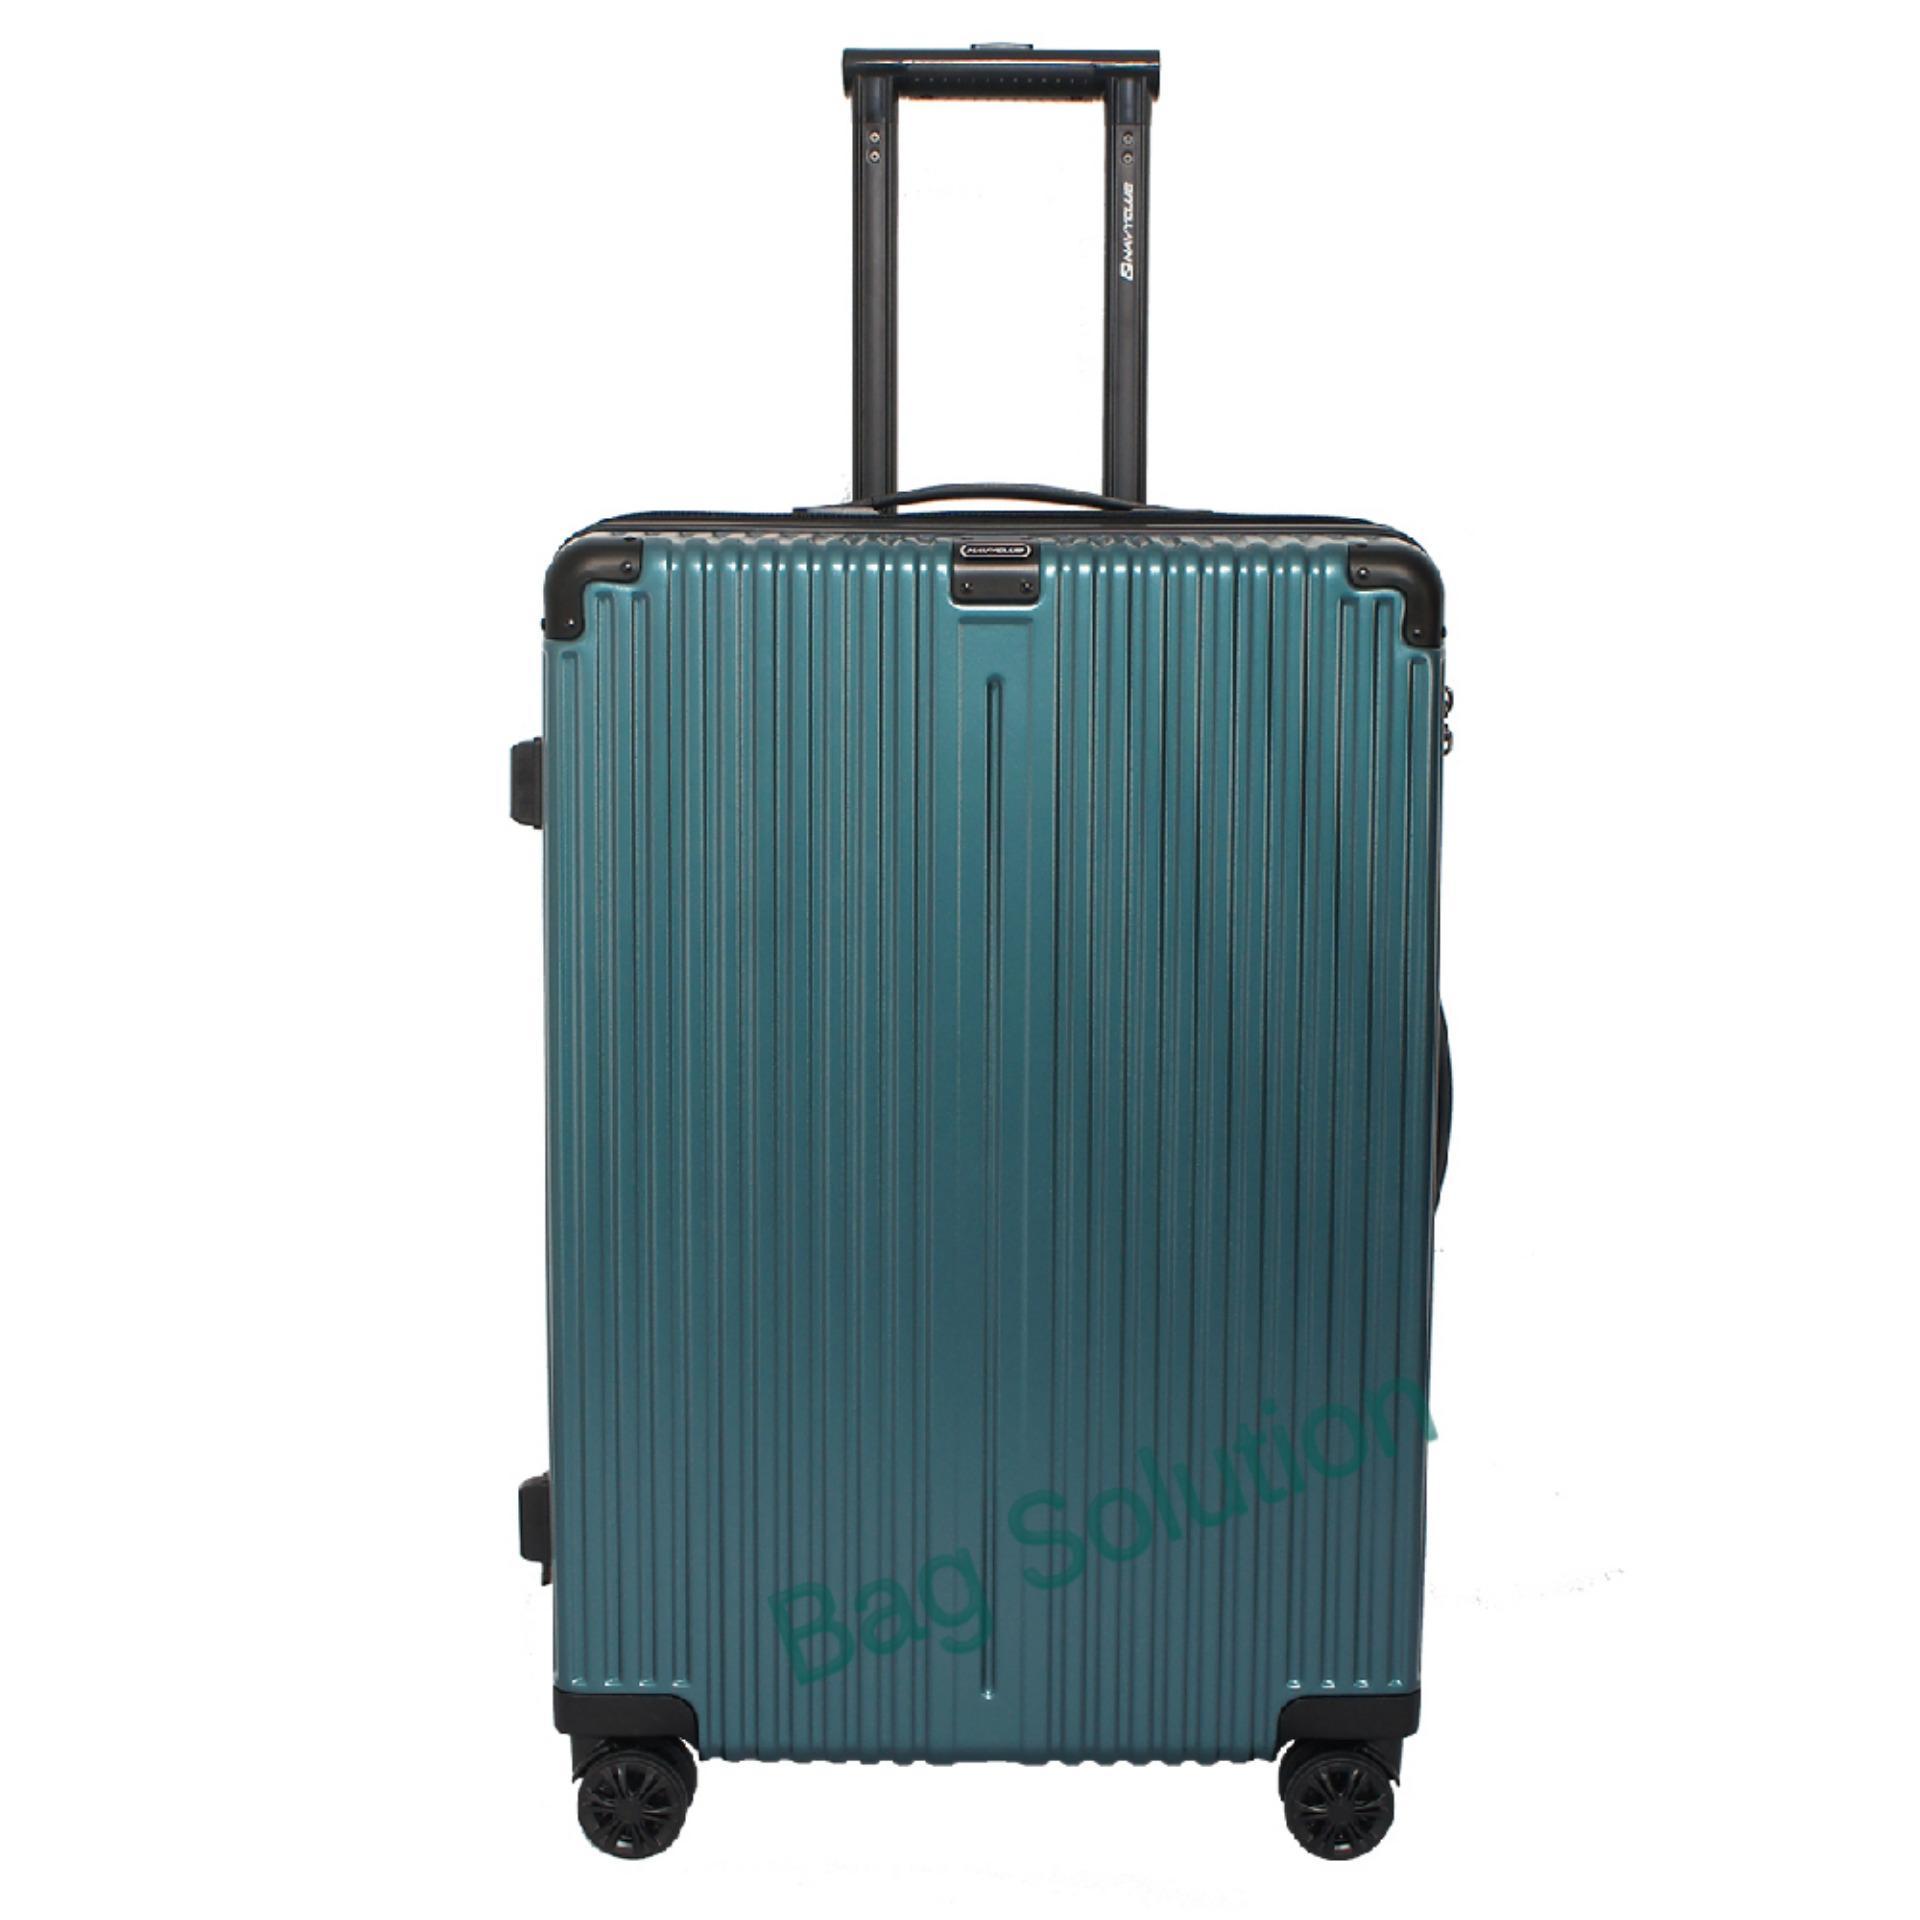 Navy Club Tas Koper Hardcase Fiber PC - 4 Roda - Resleting Anti Tusuk Expandable - Kunci TSA - CHGG Size 24 Inch - Hijau